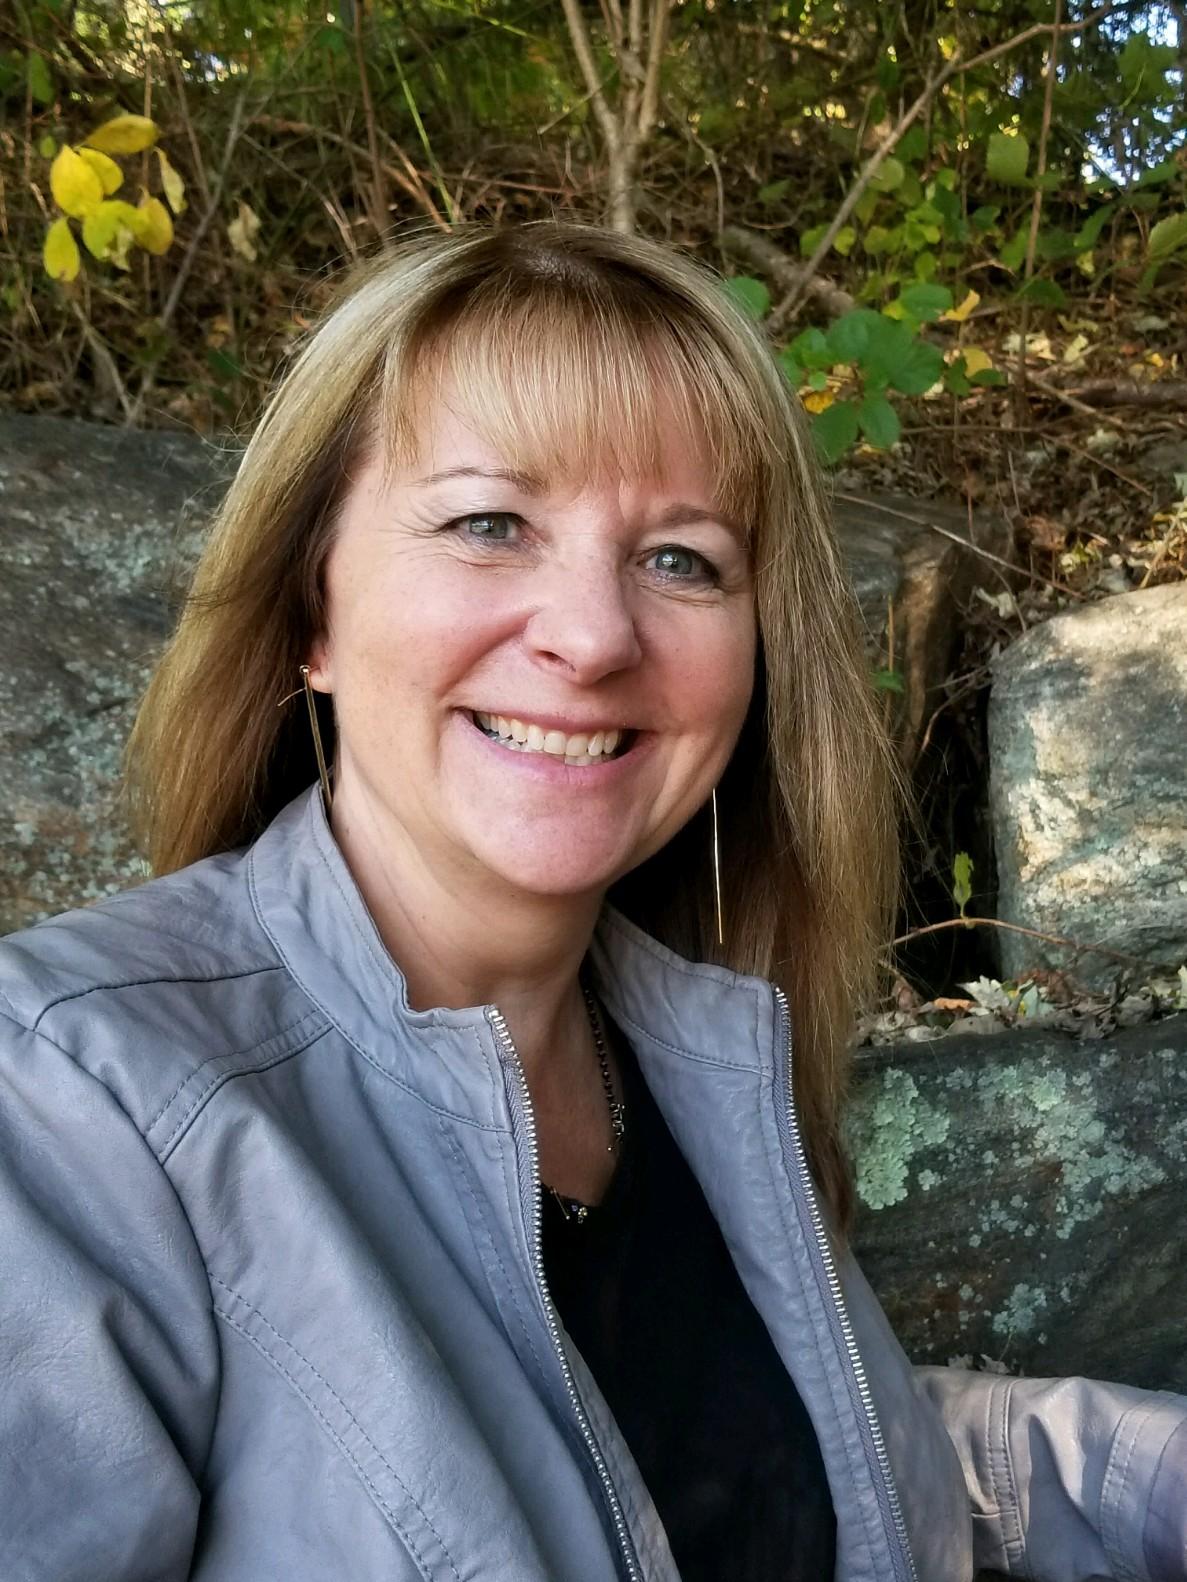 Karen Restivo